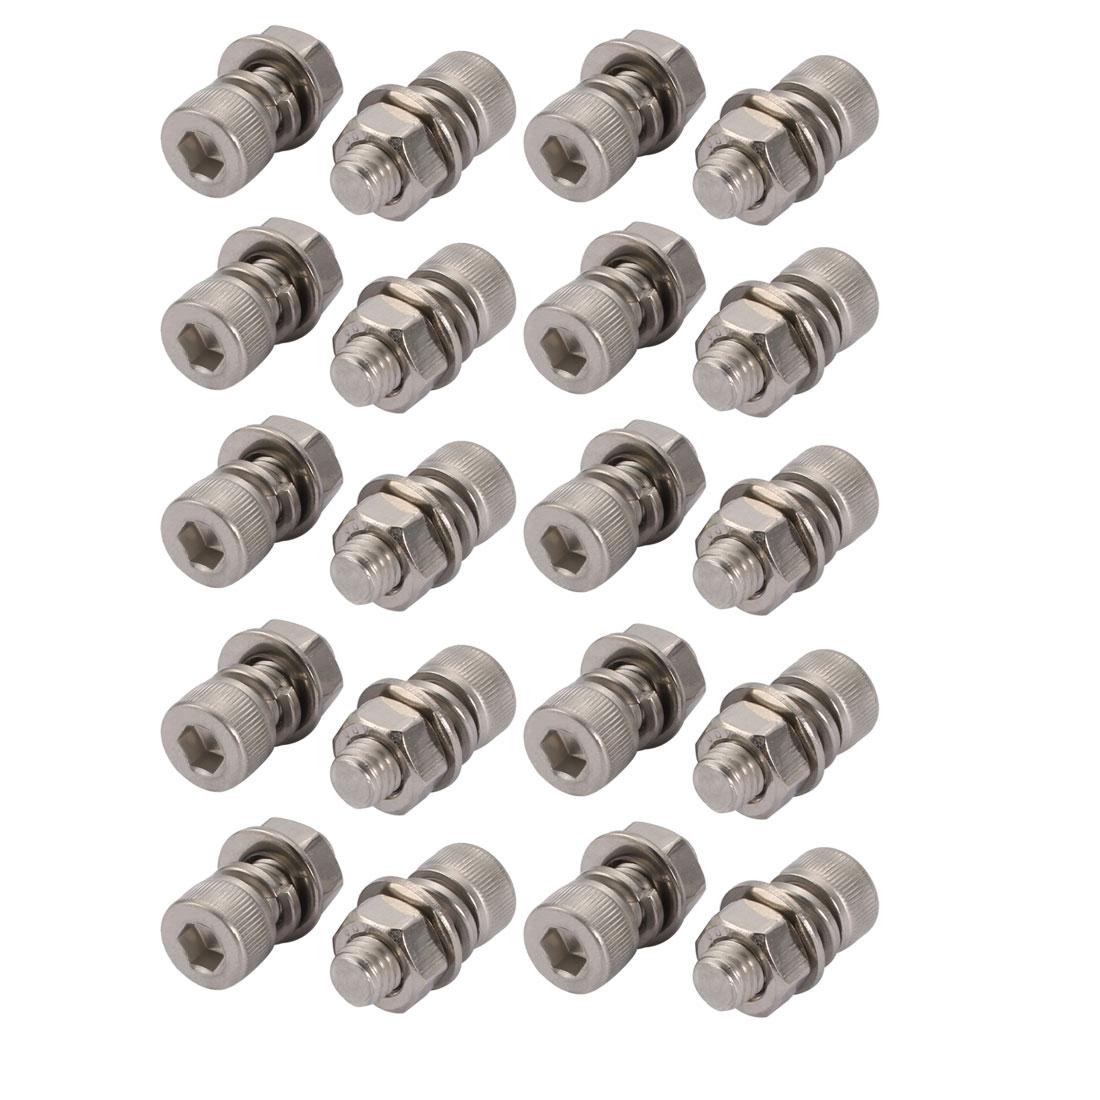 20Pcs M8x18mm 304 Stainless Steel Knurled Hex Socket Head Bolt Nut Set w Washer